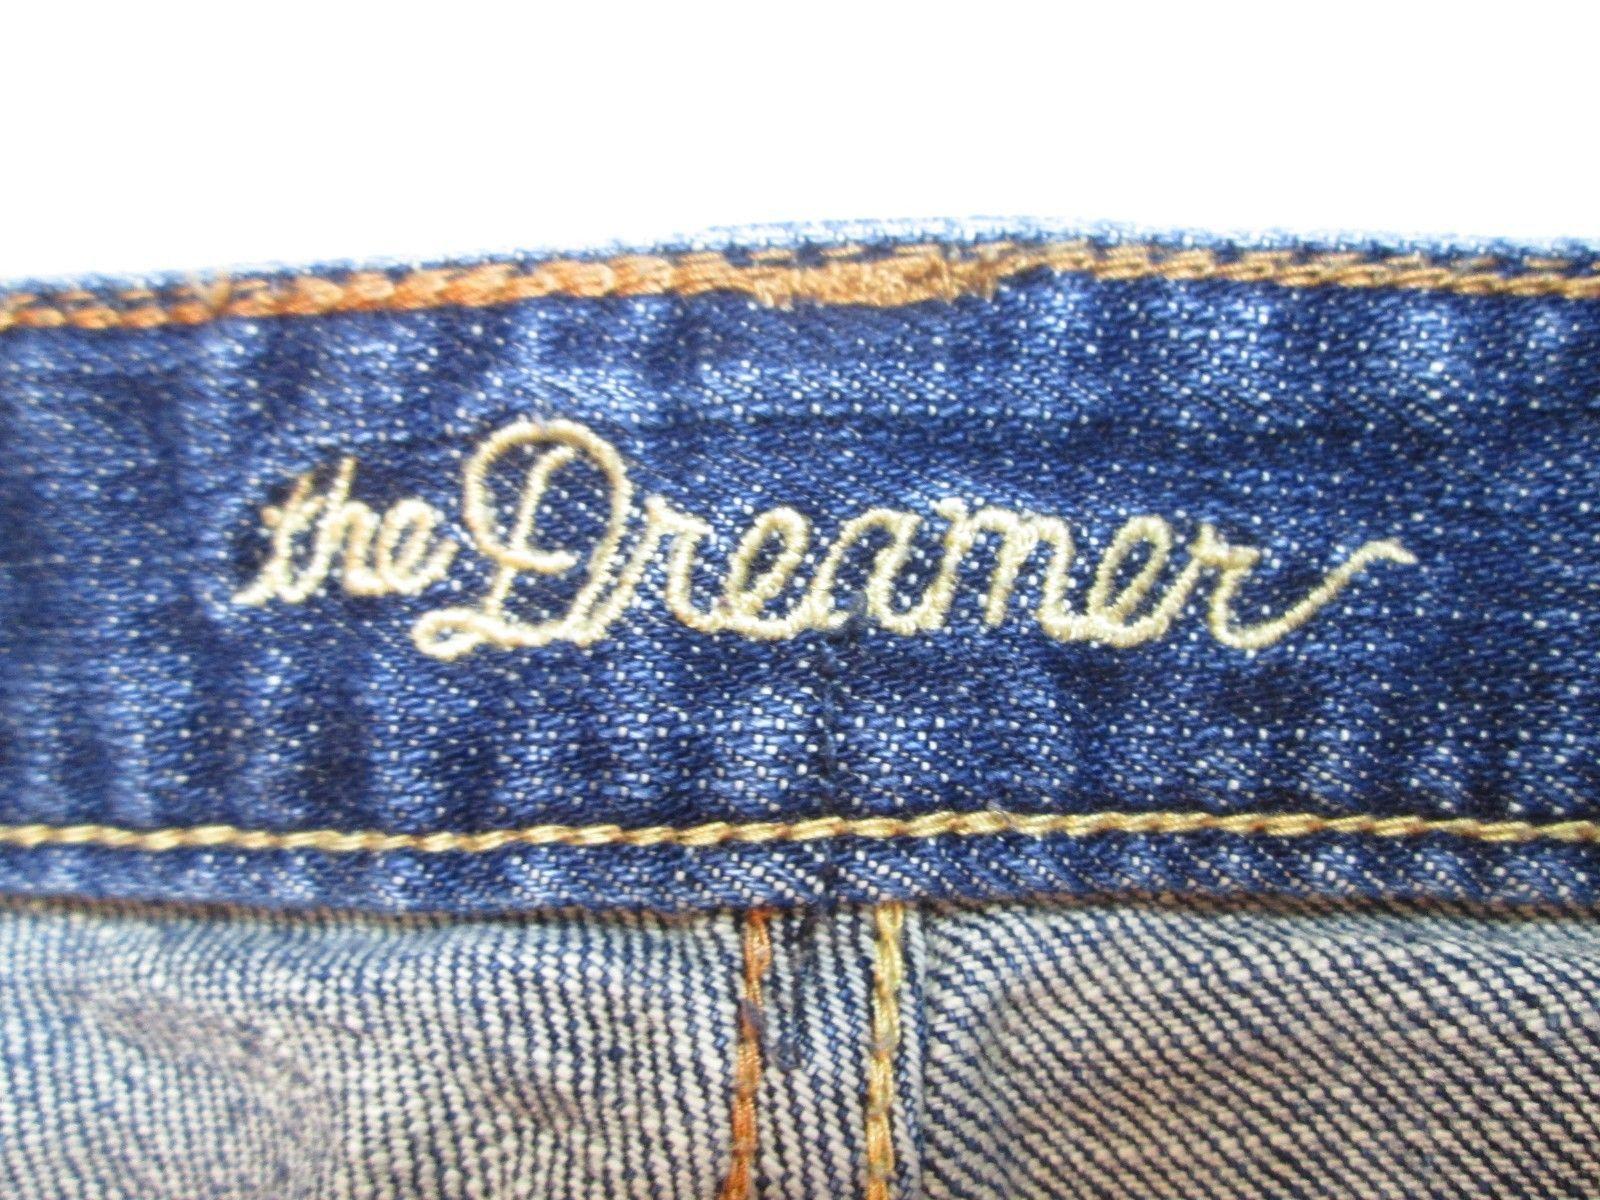 Old Navy Women Jeans Plus Size 20 Regular Inseam 30.5  #O1